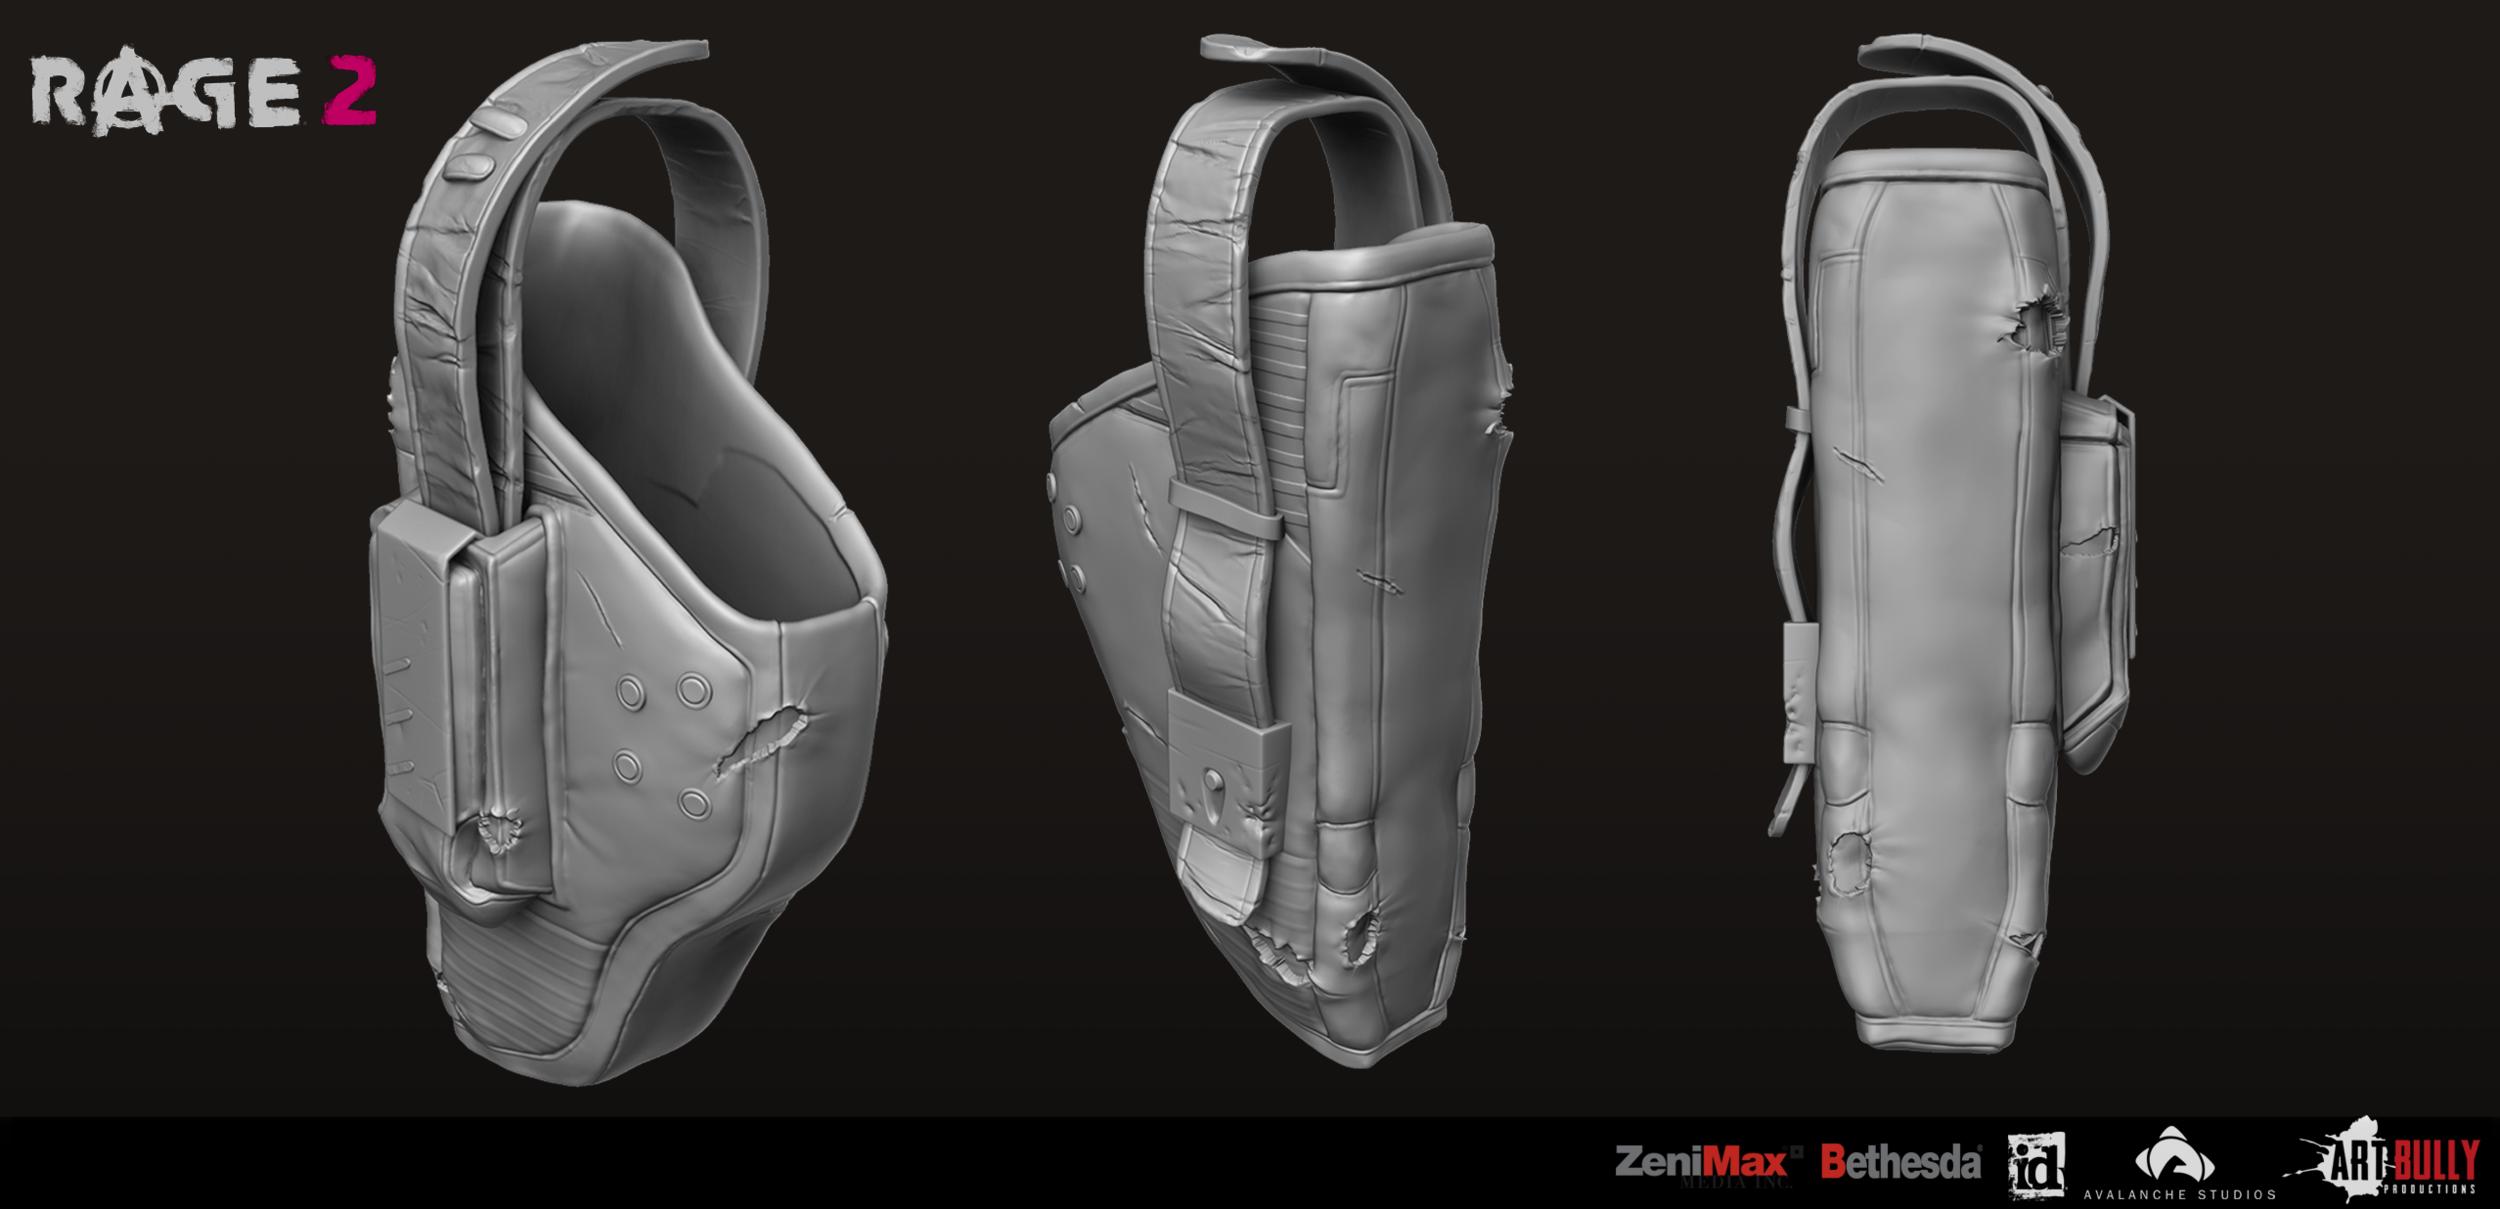 Civilian_Gear_Set_03_Weapon_Holsters_01_Waist_Holster_render.png